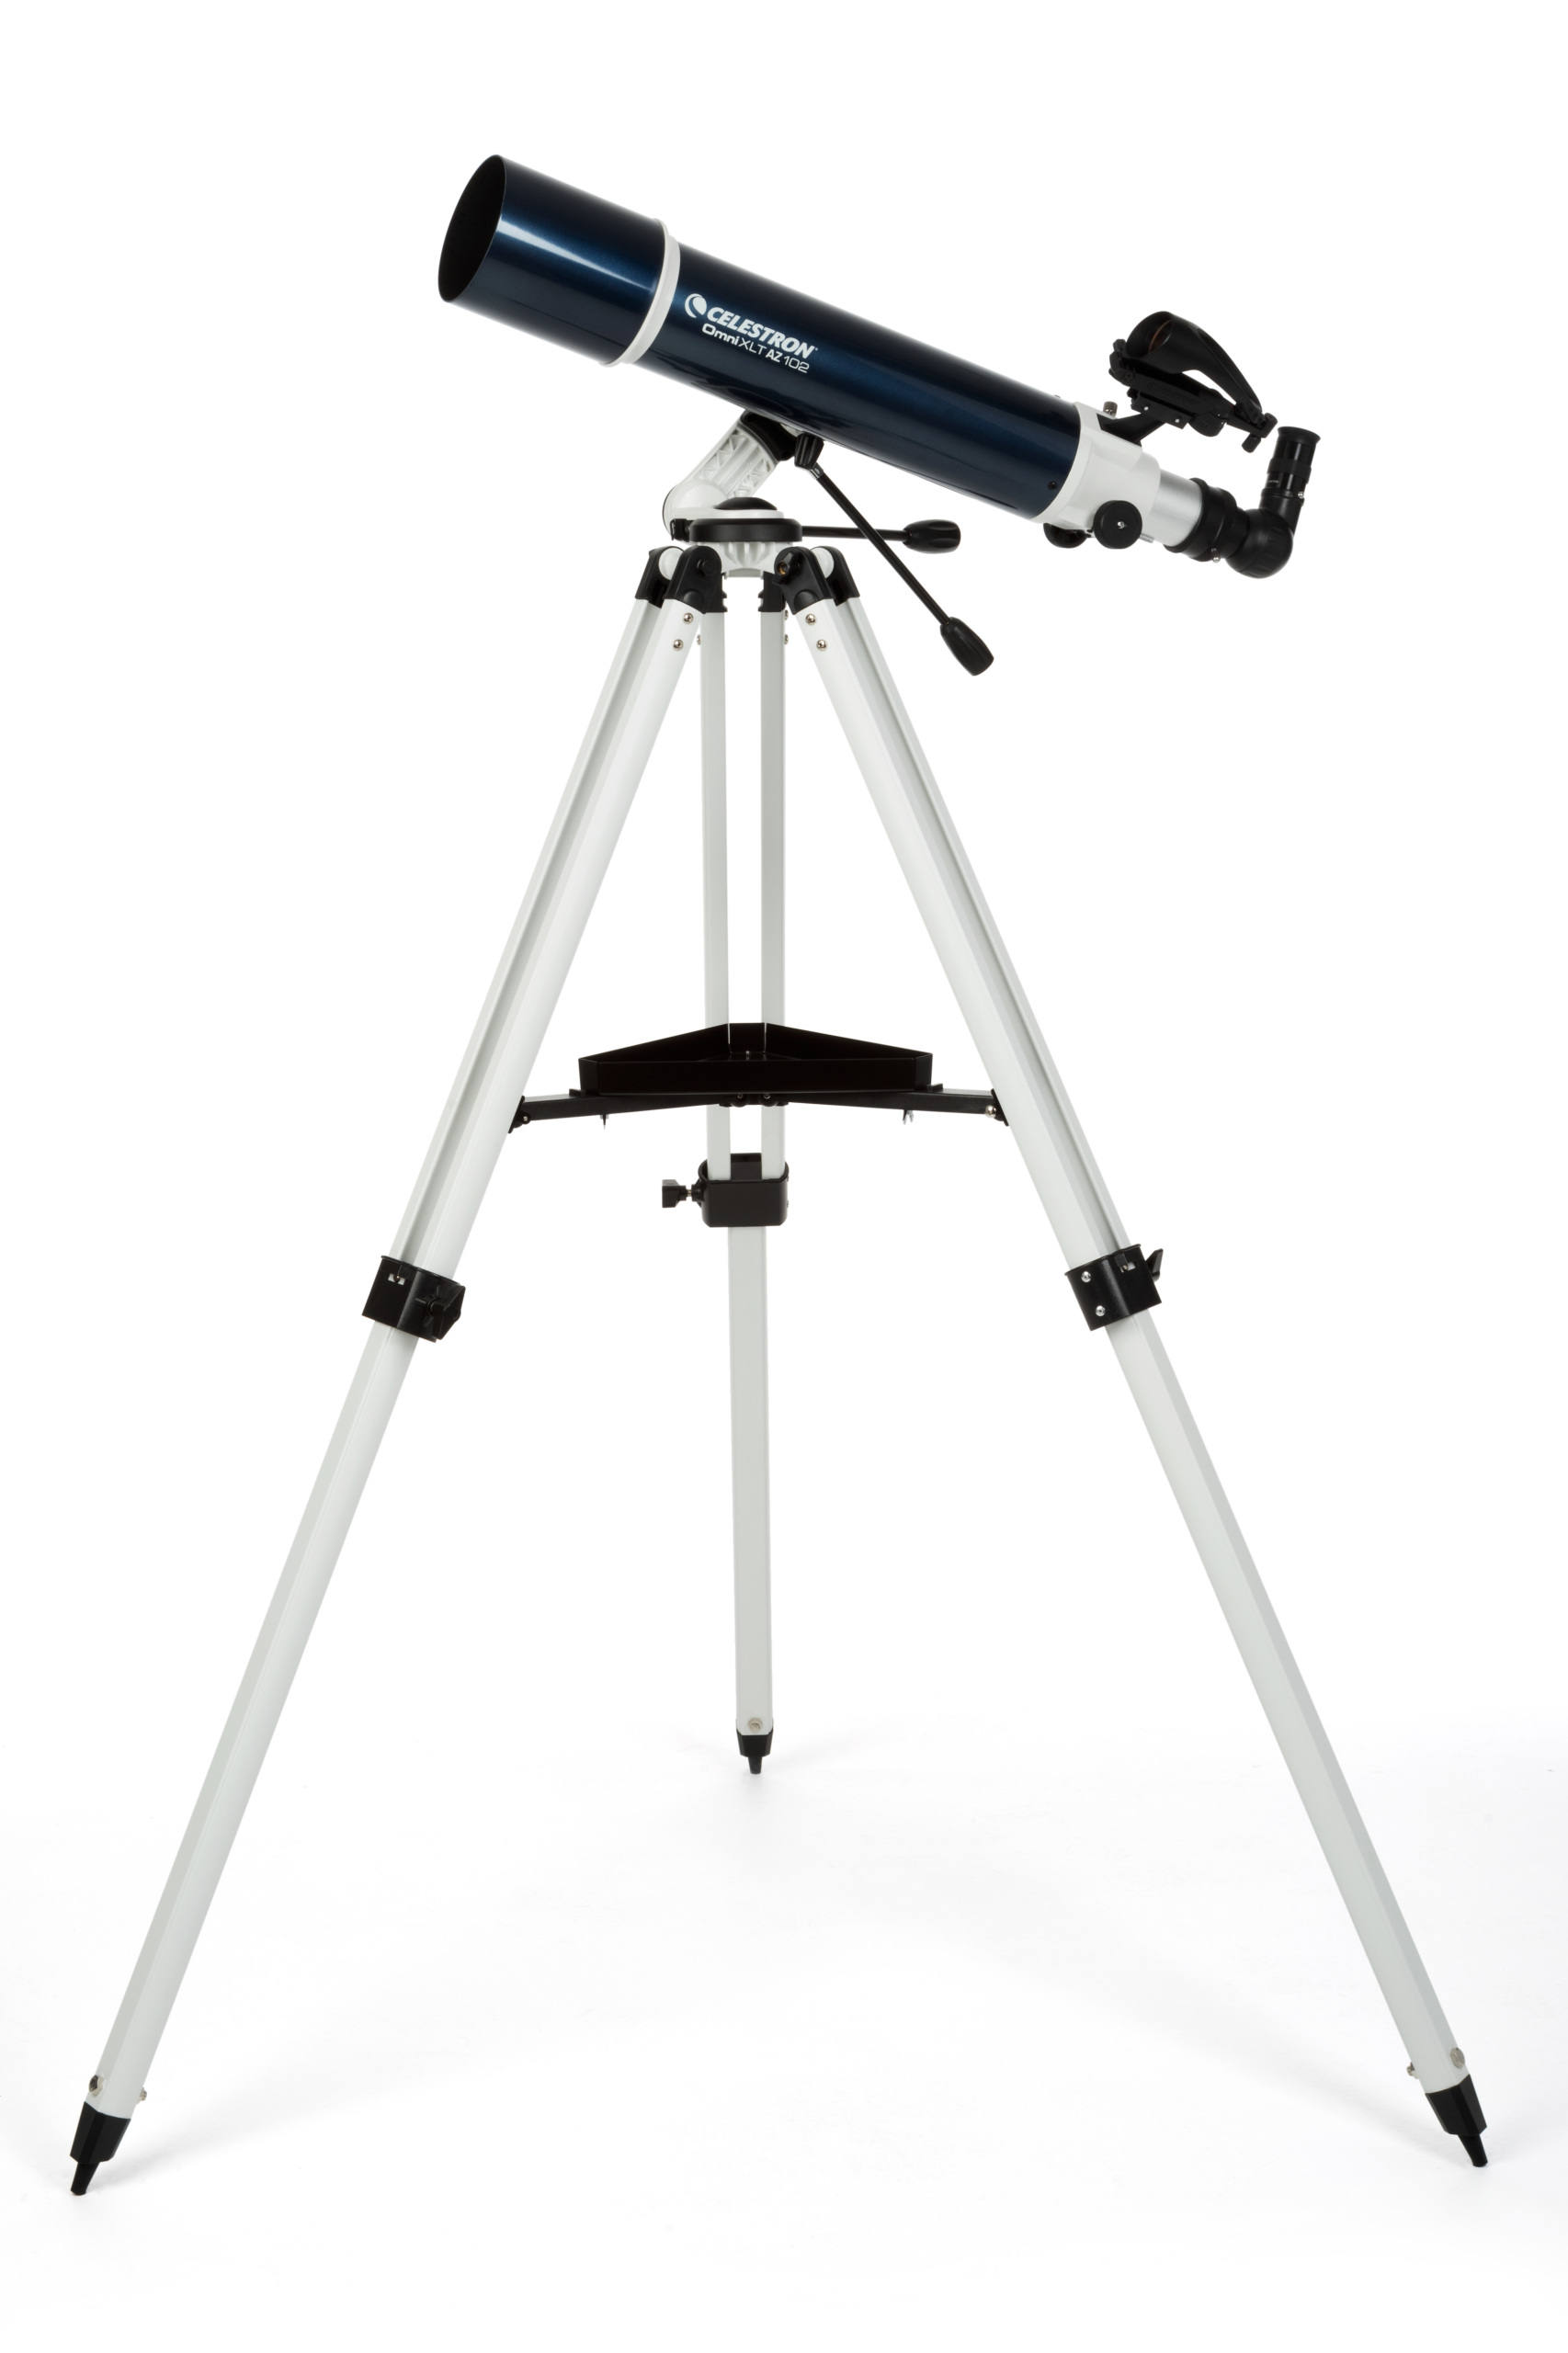 Celestron Omni XLT AZ 102 mm Refractor